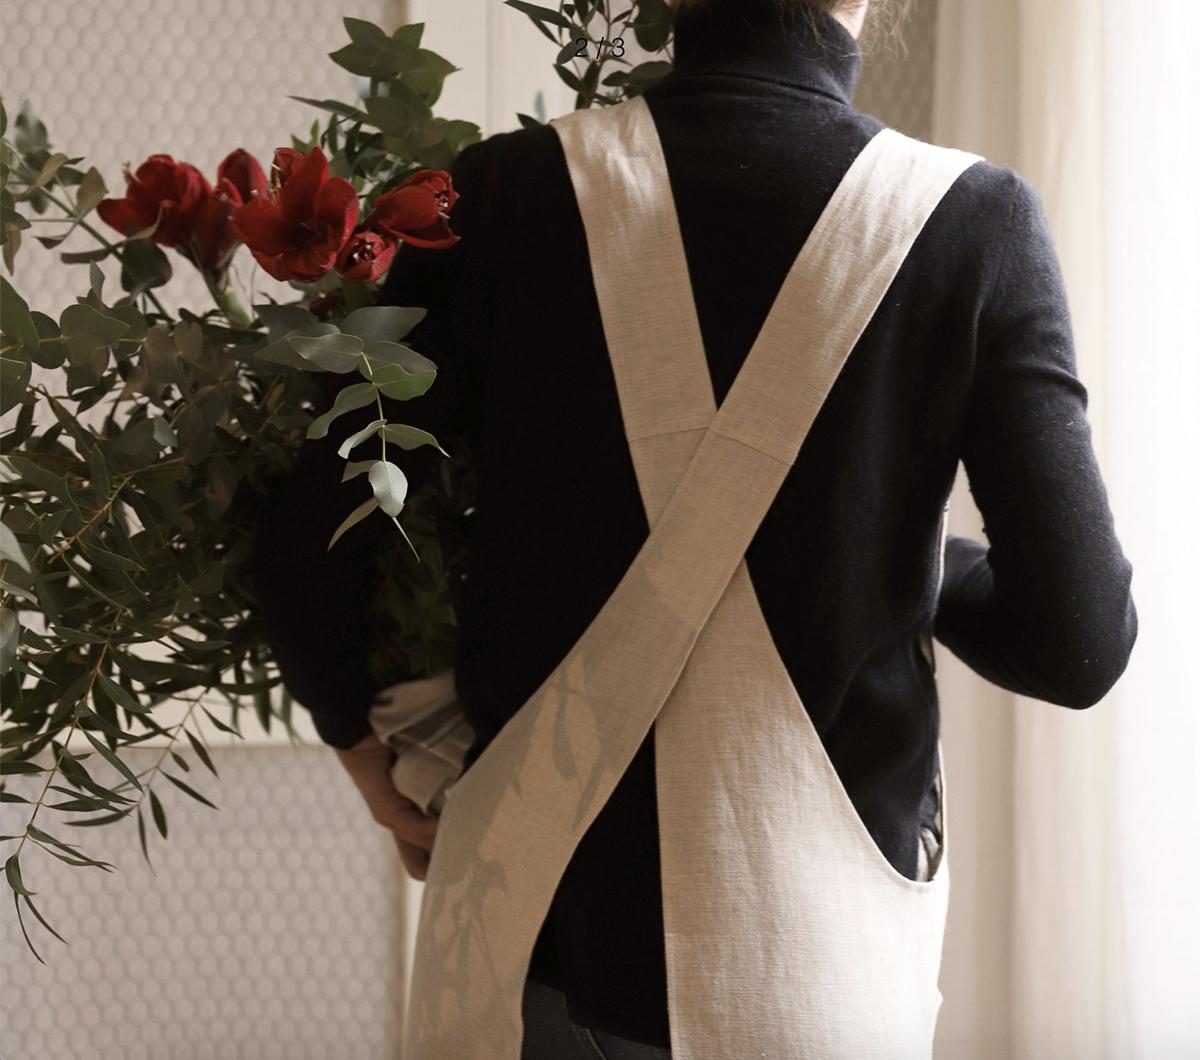 apron-back-g